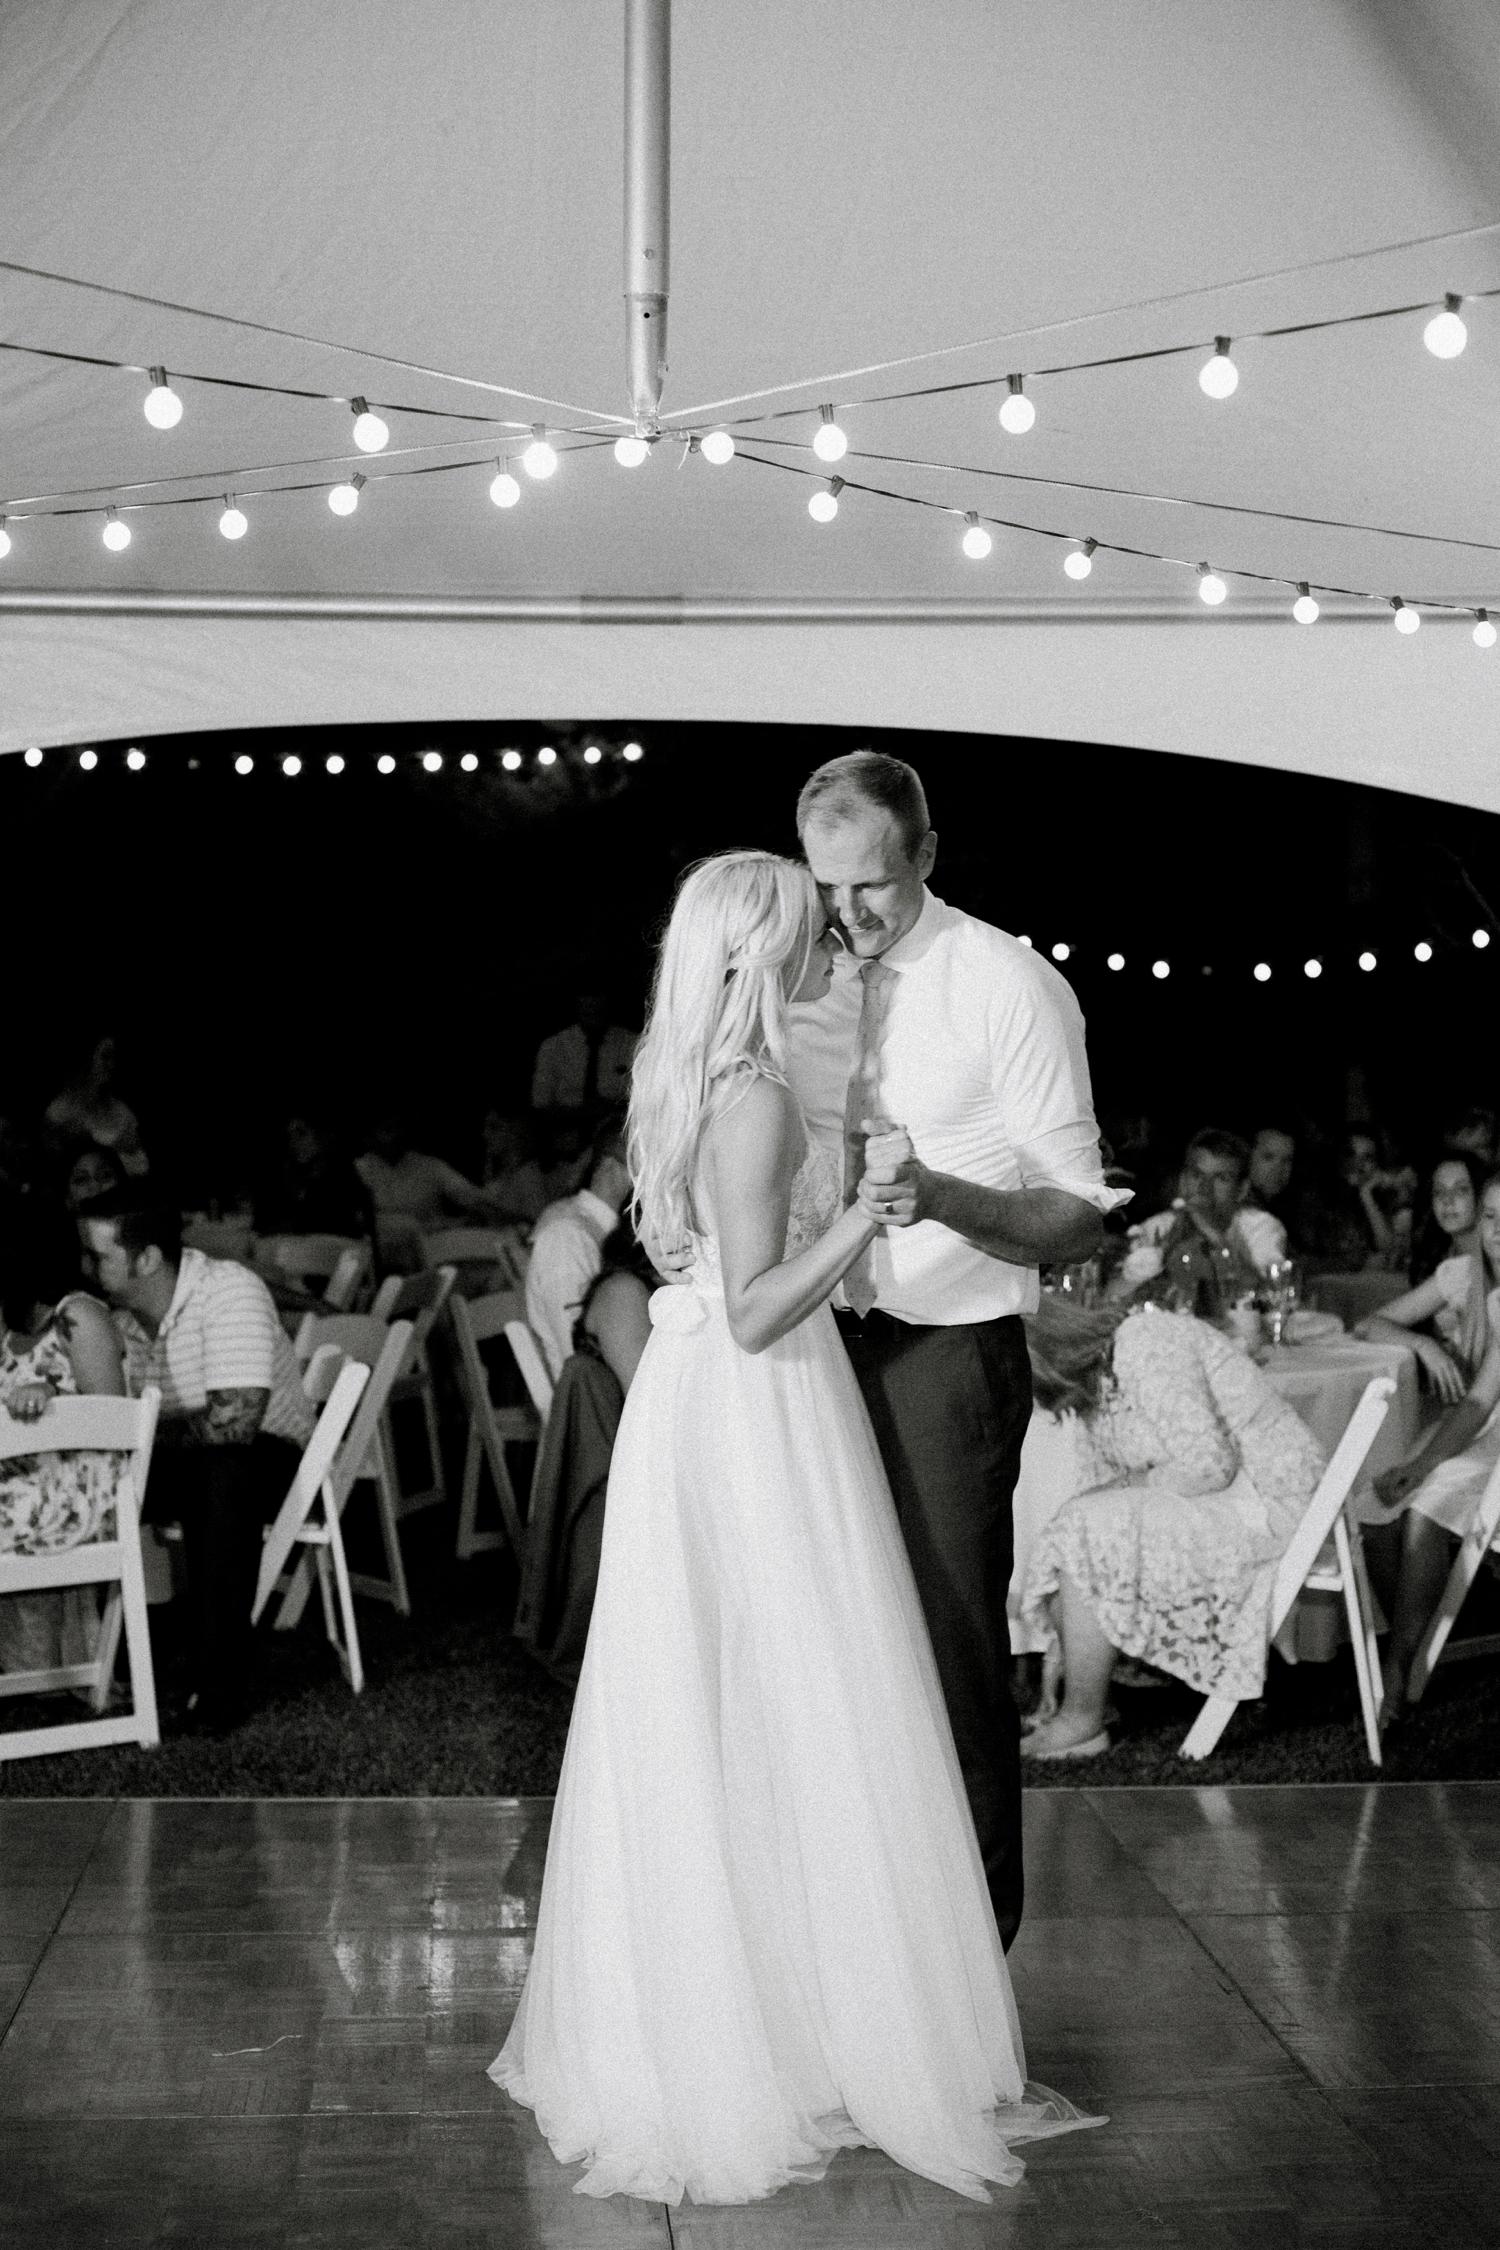 zion-wedding-photography-0109.jpg